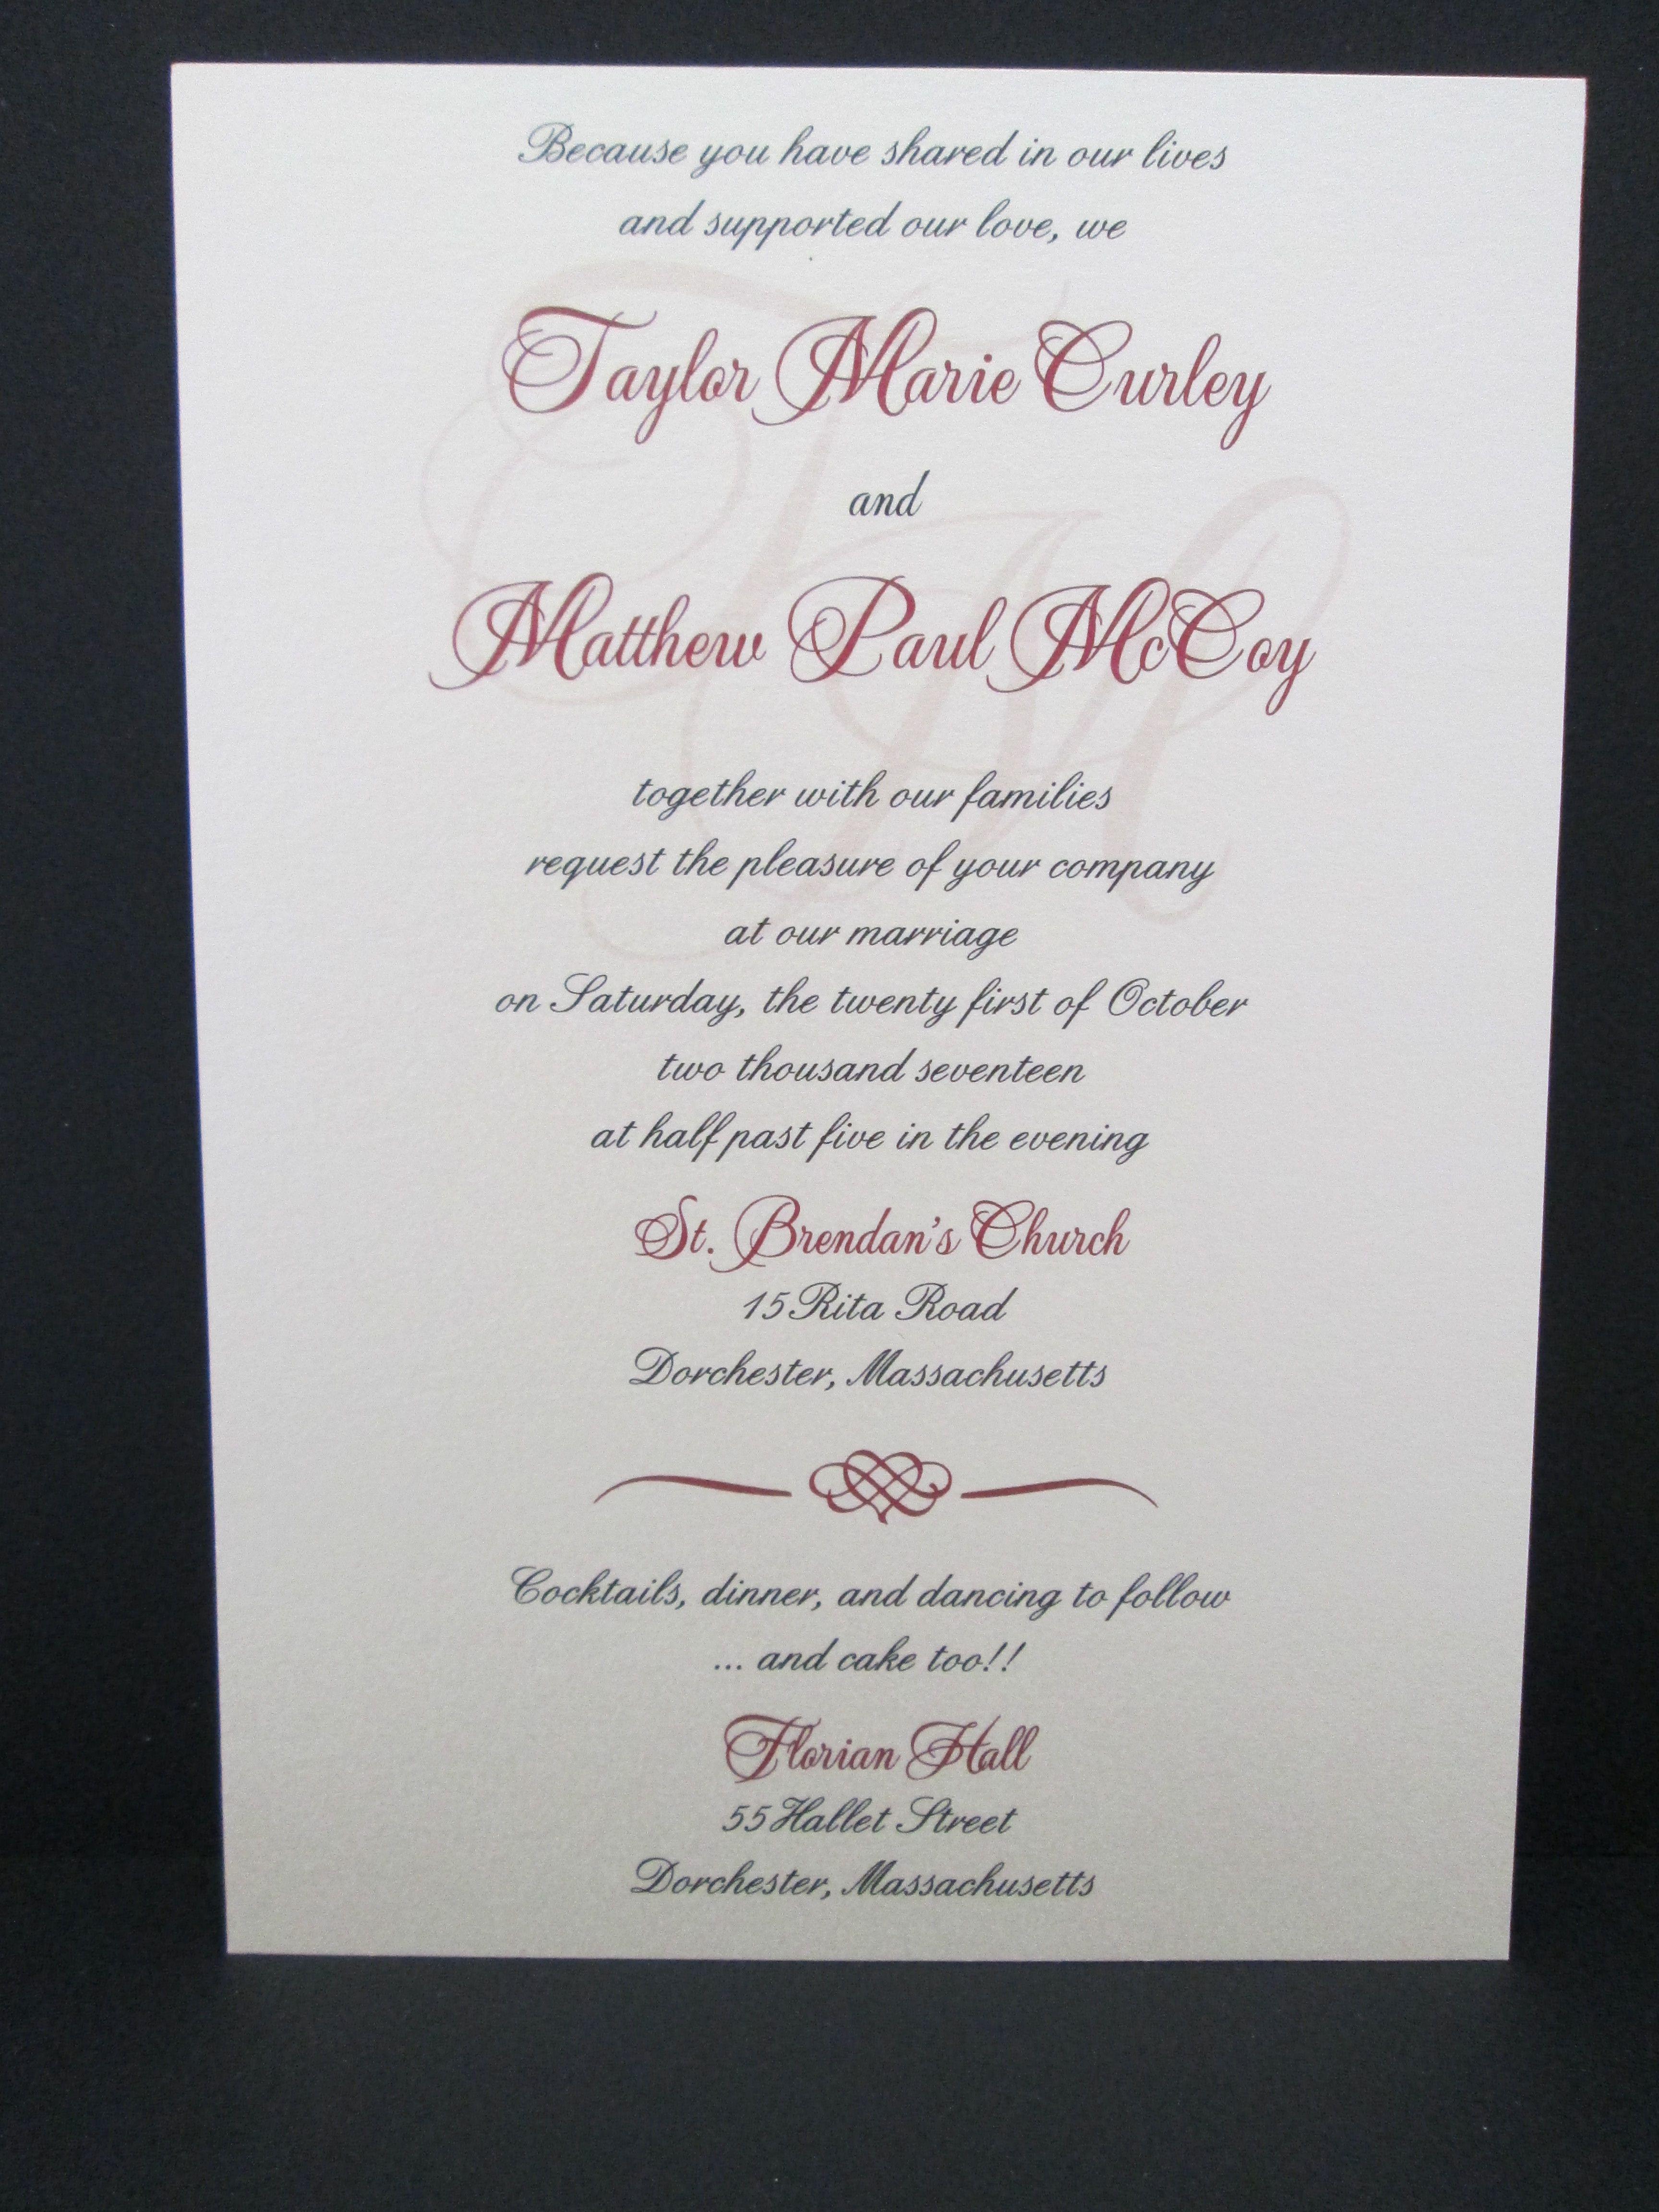 Burgundy Invitation Making Wedding Invitations Custom Day Pi: Pi Day Wedding Cards At Websimilar.org